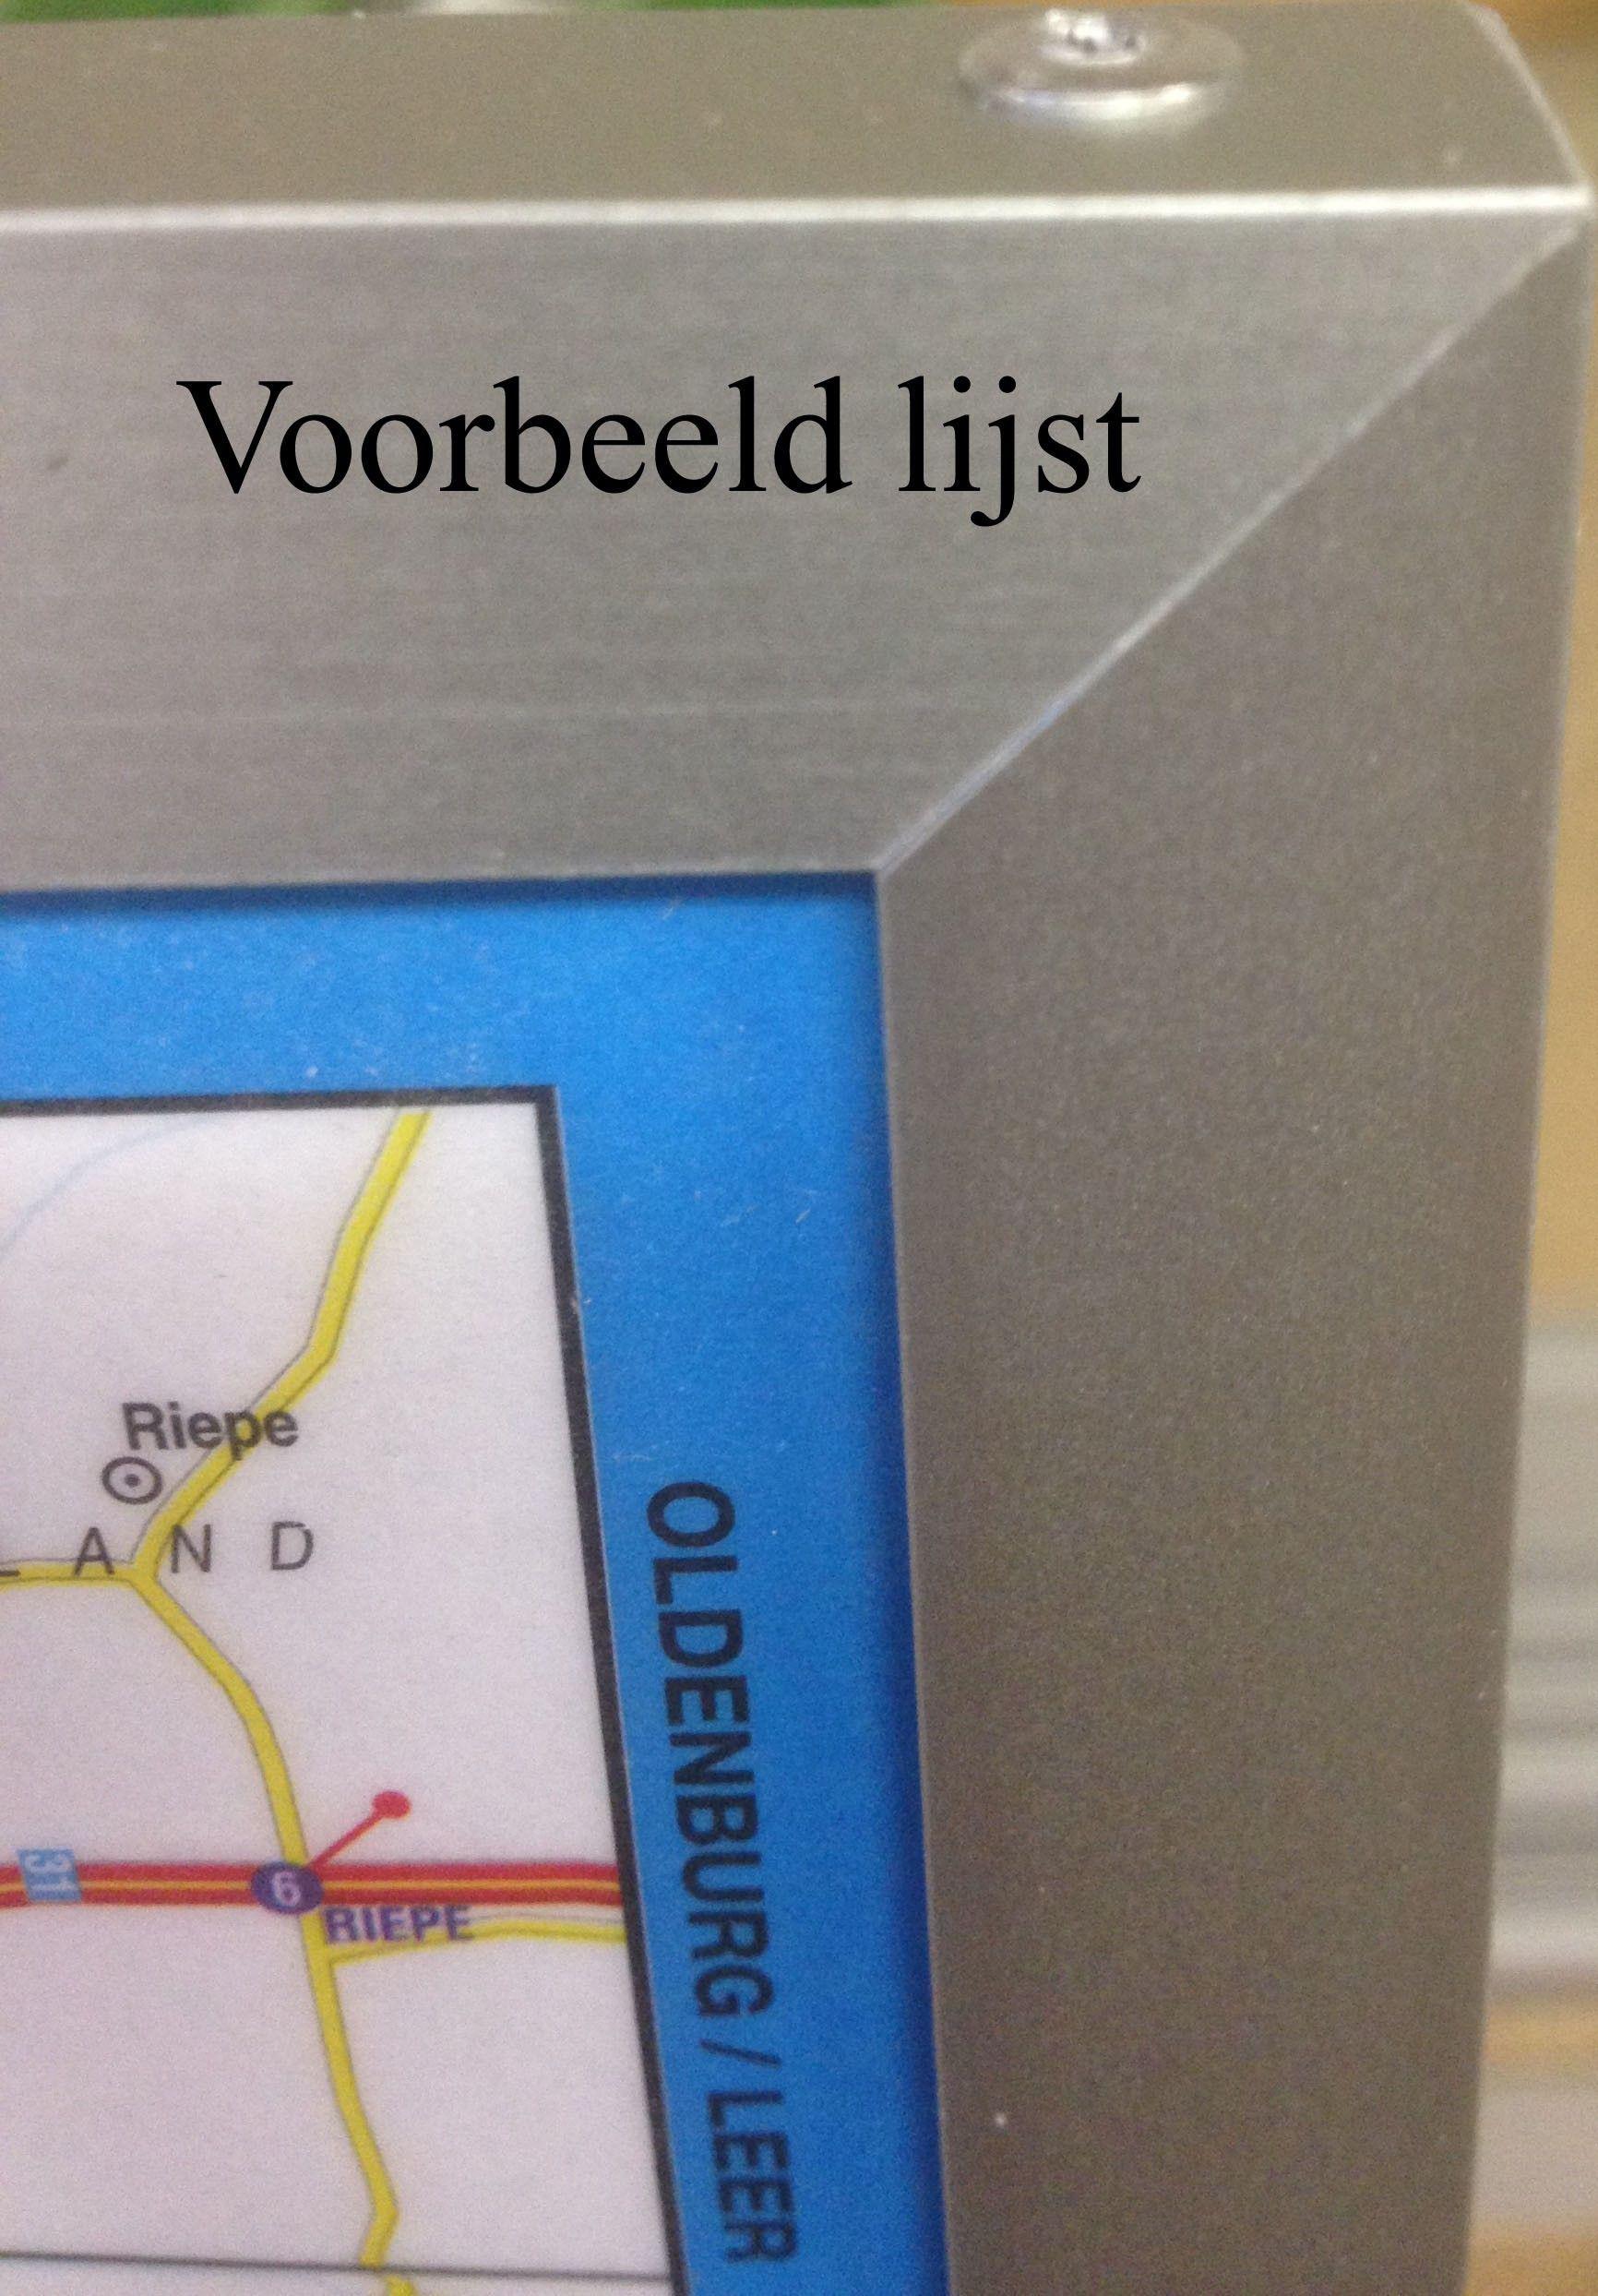 Gemeentekaart van Nederland